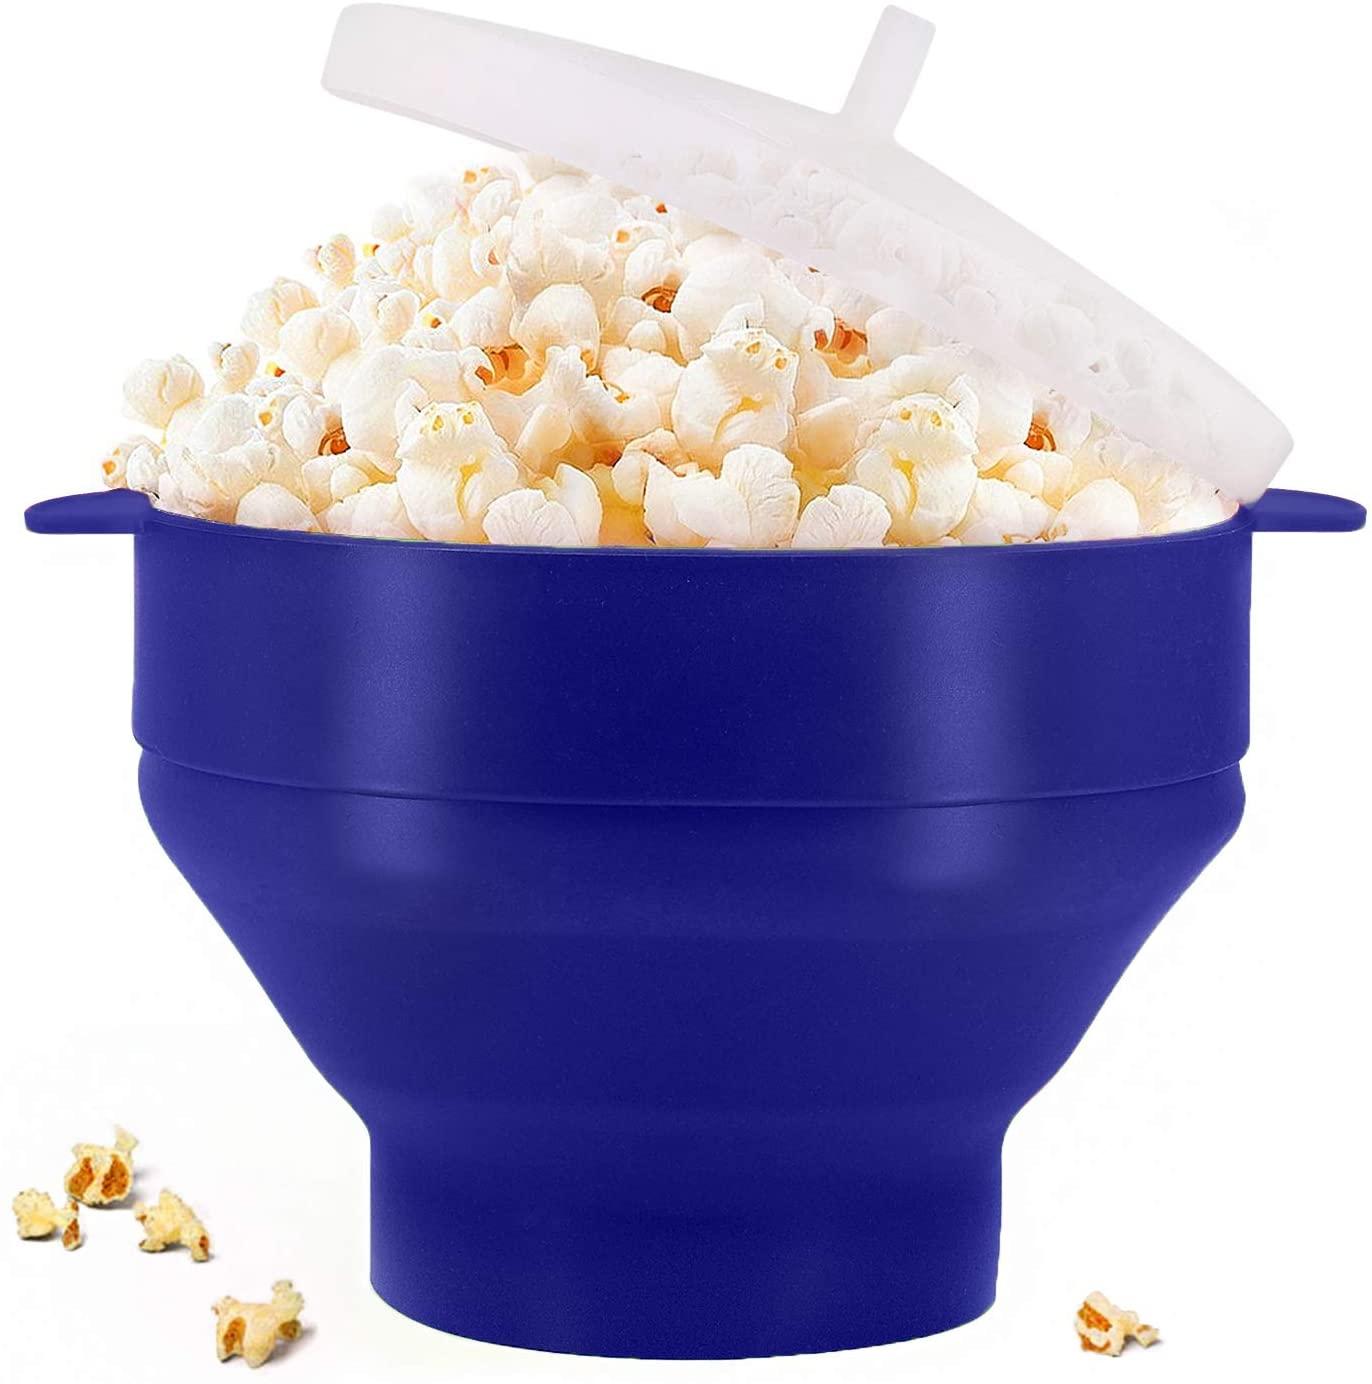 POP STAR - Silicone Popcorn Popper - Blue